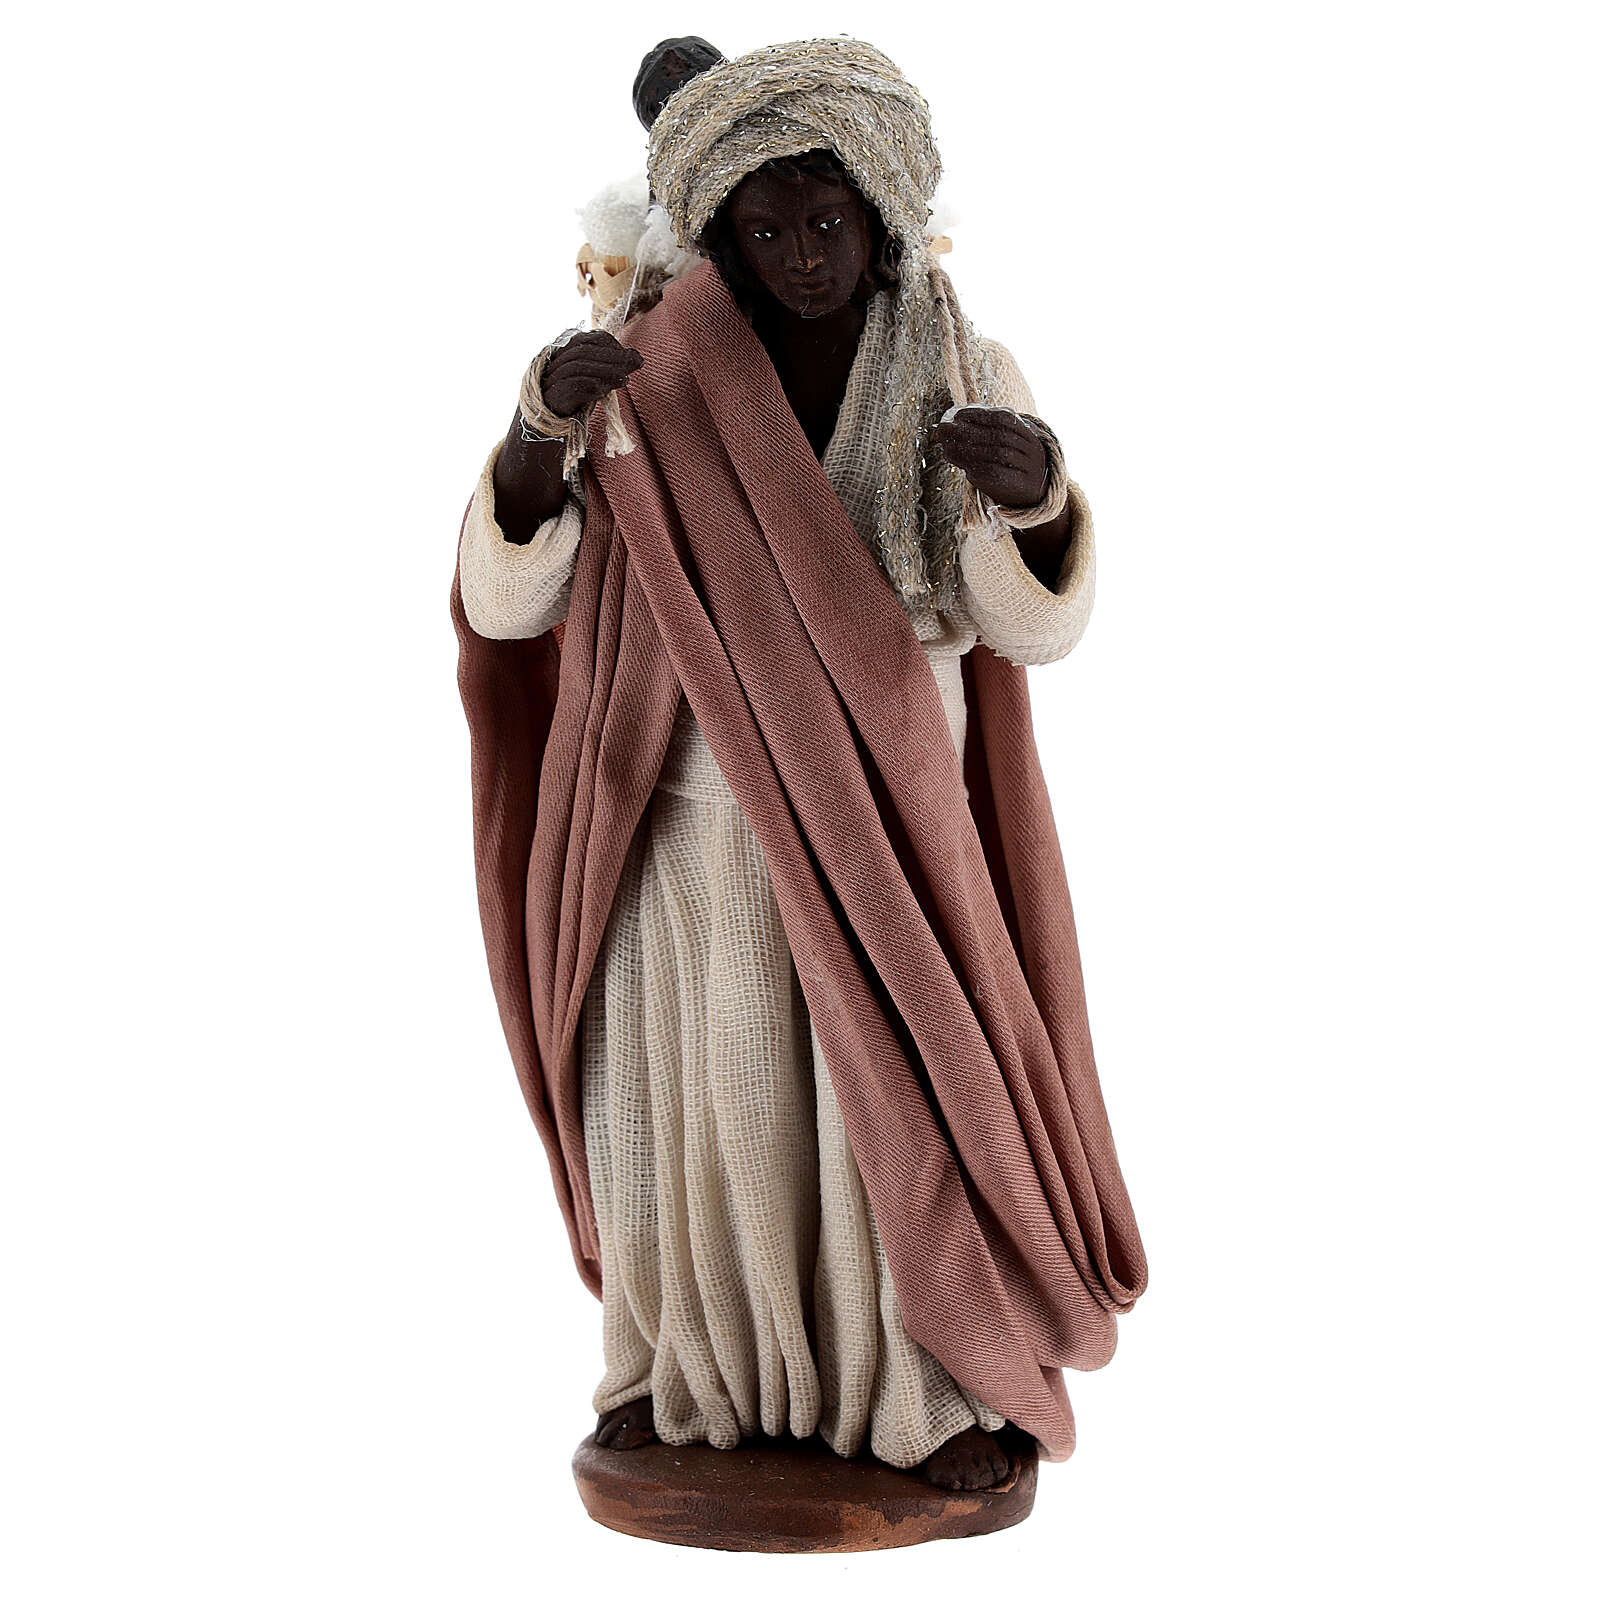 Moor women with child in basket Neapolitan Nativity Scene figurine 13 cm 4